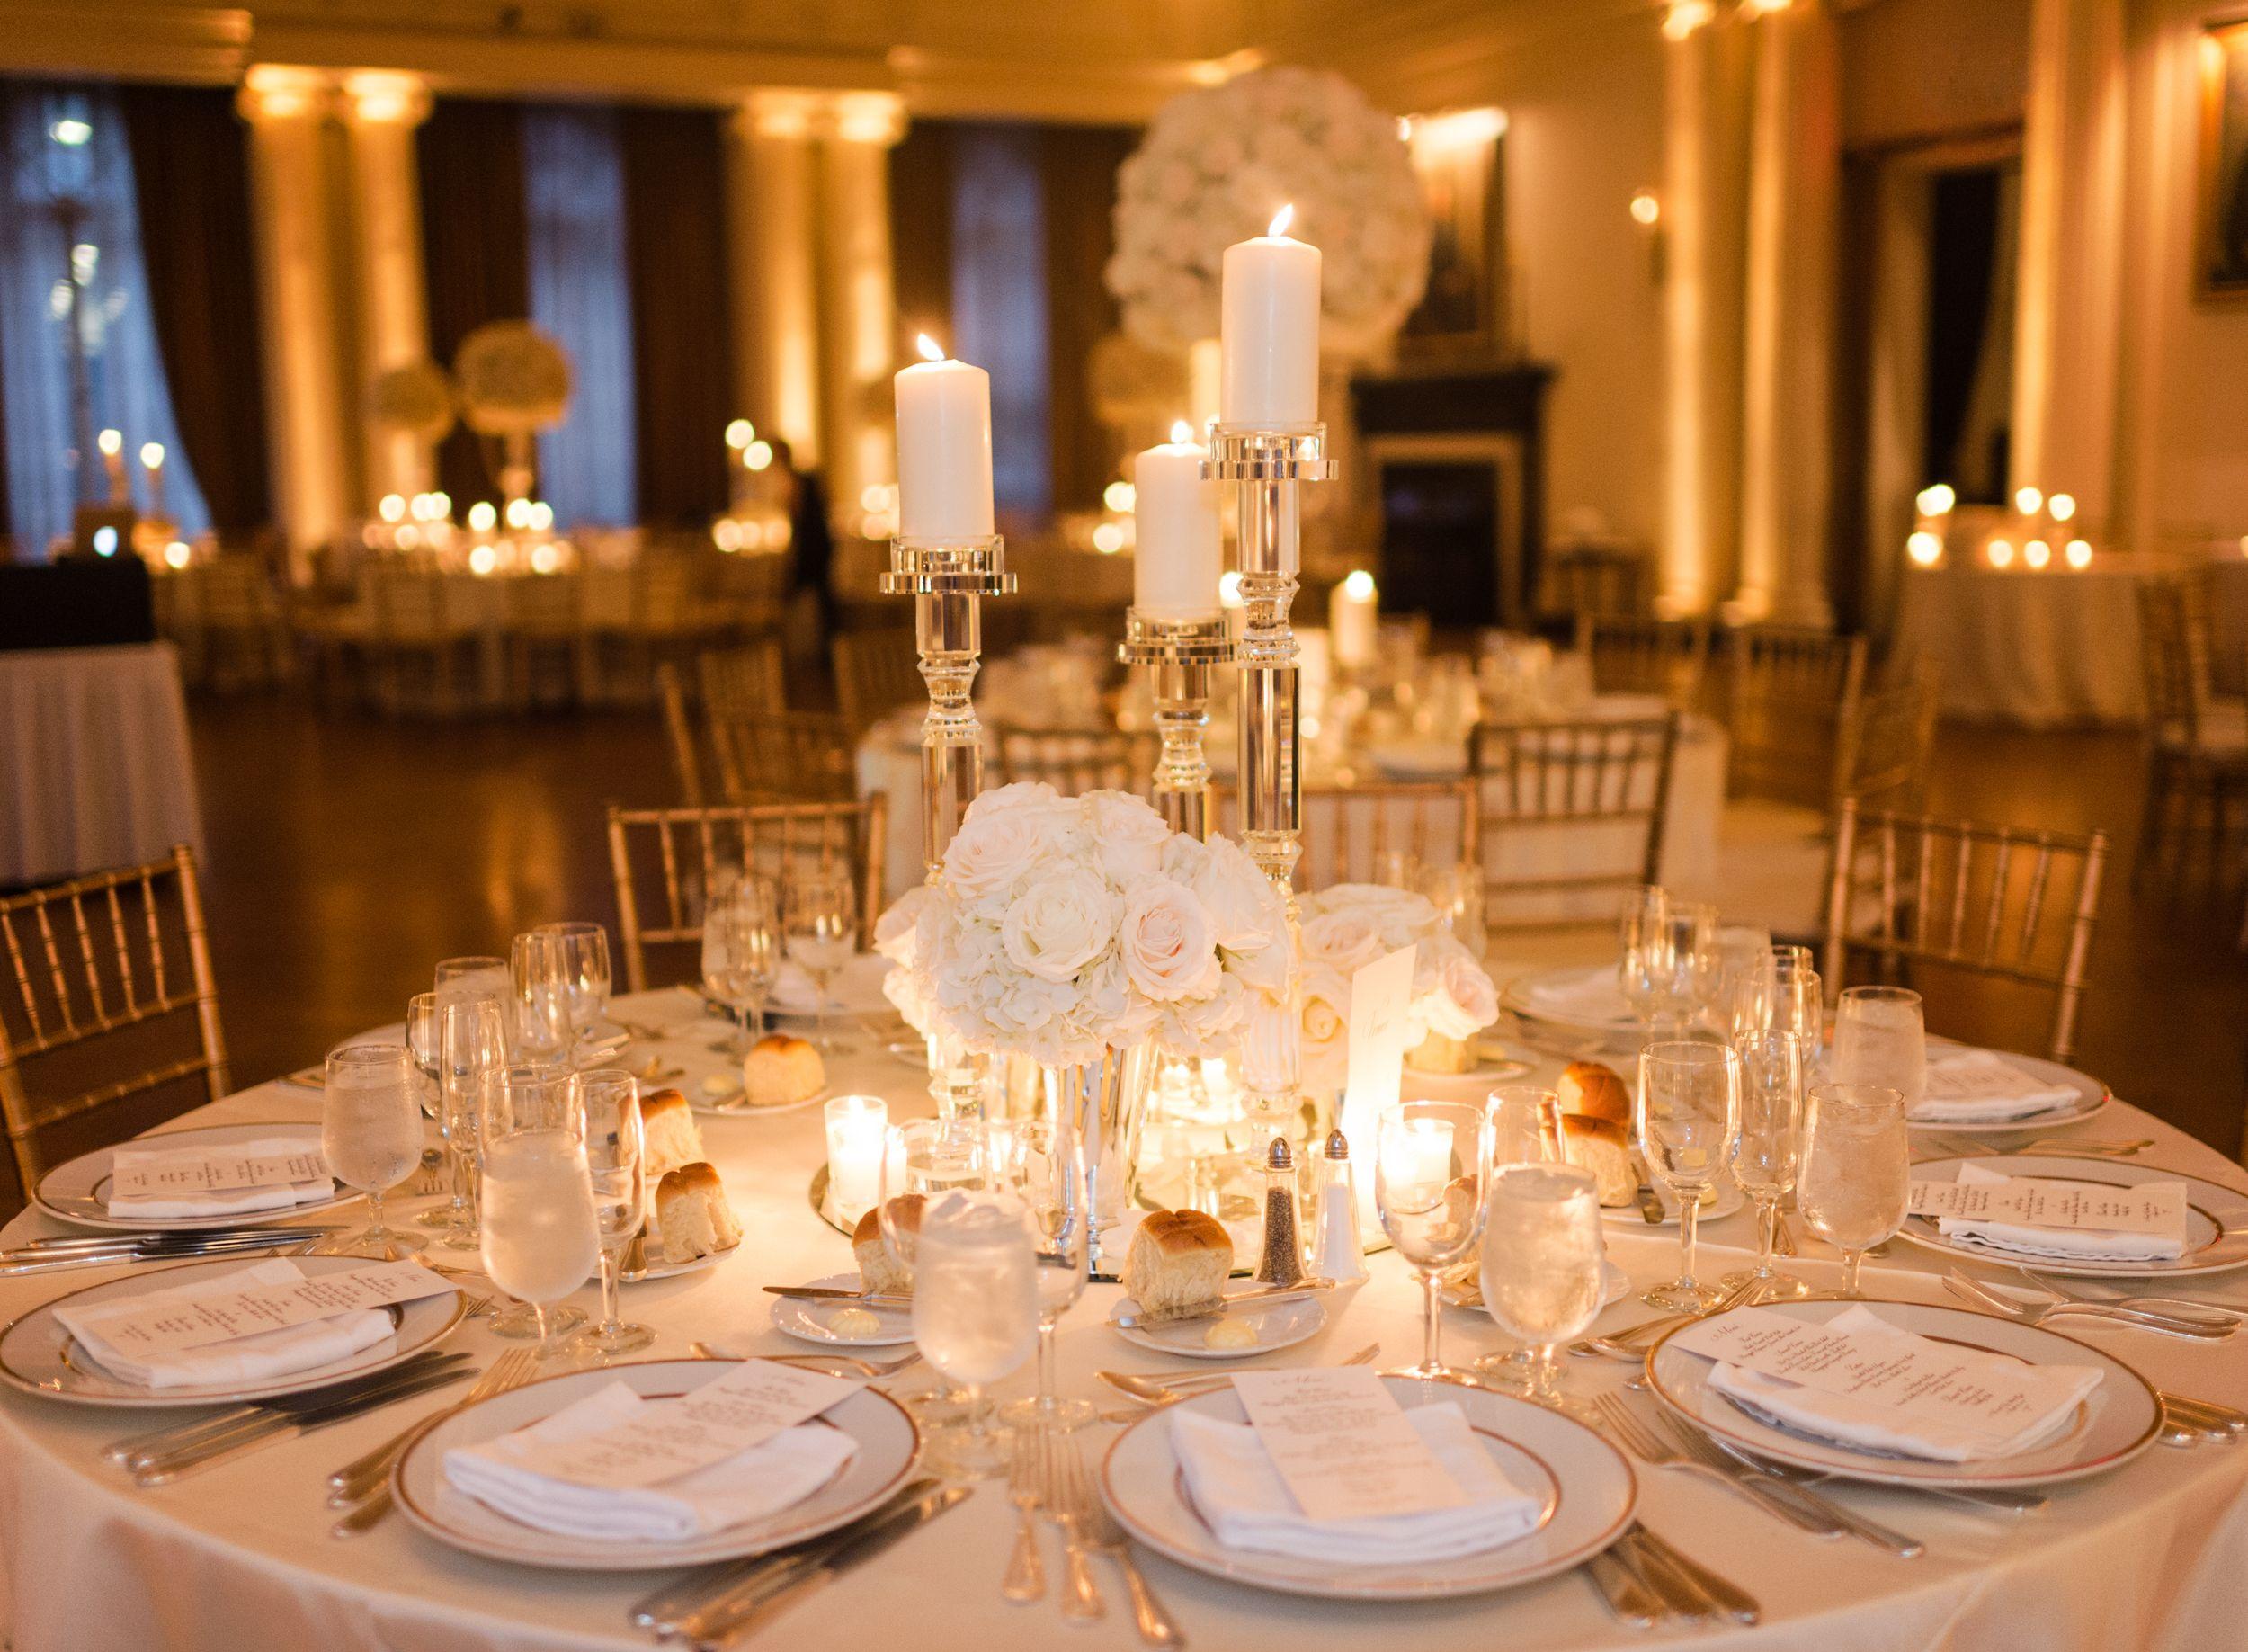 Wedding reception decoration images  Yale Club Ballroom Wedding Reception Table Arrangements  reception